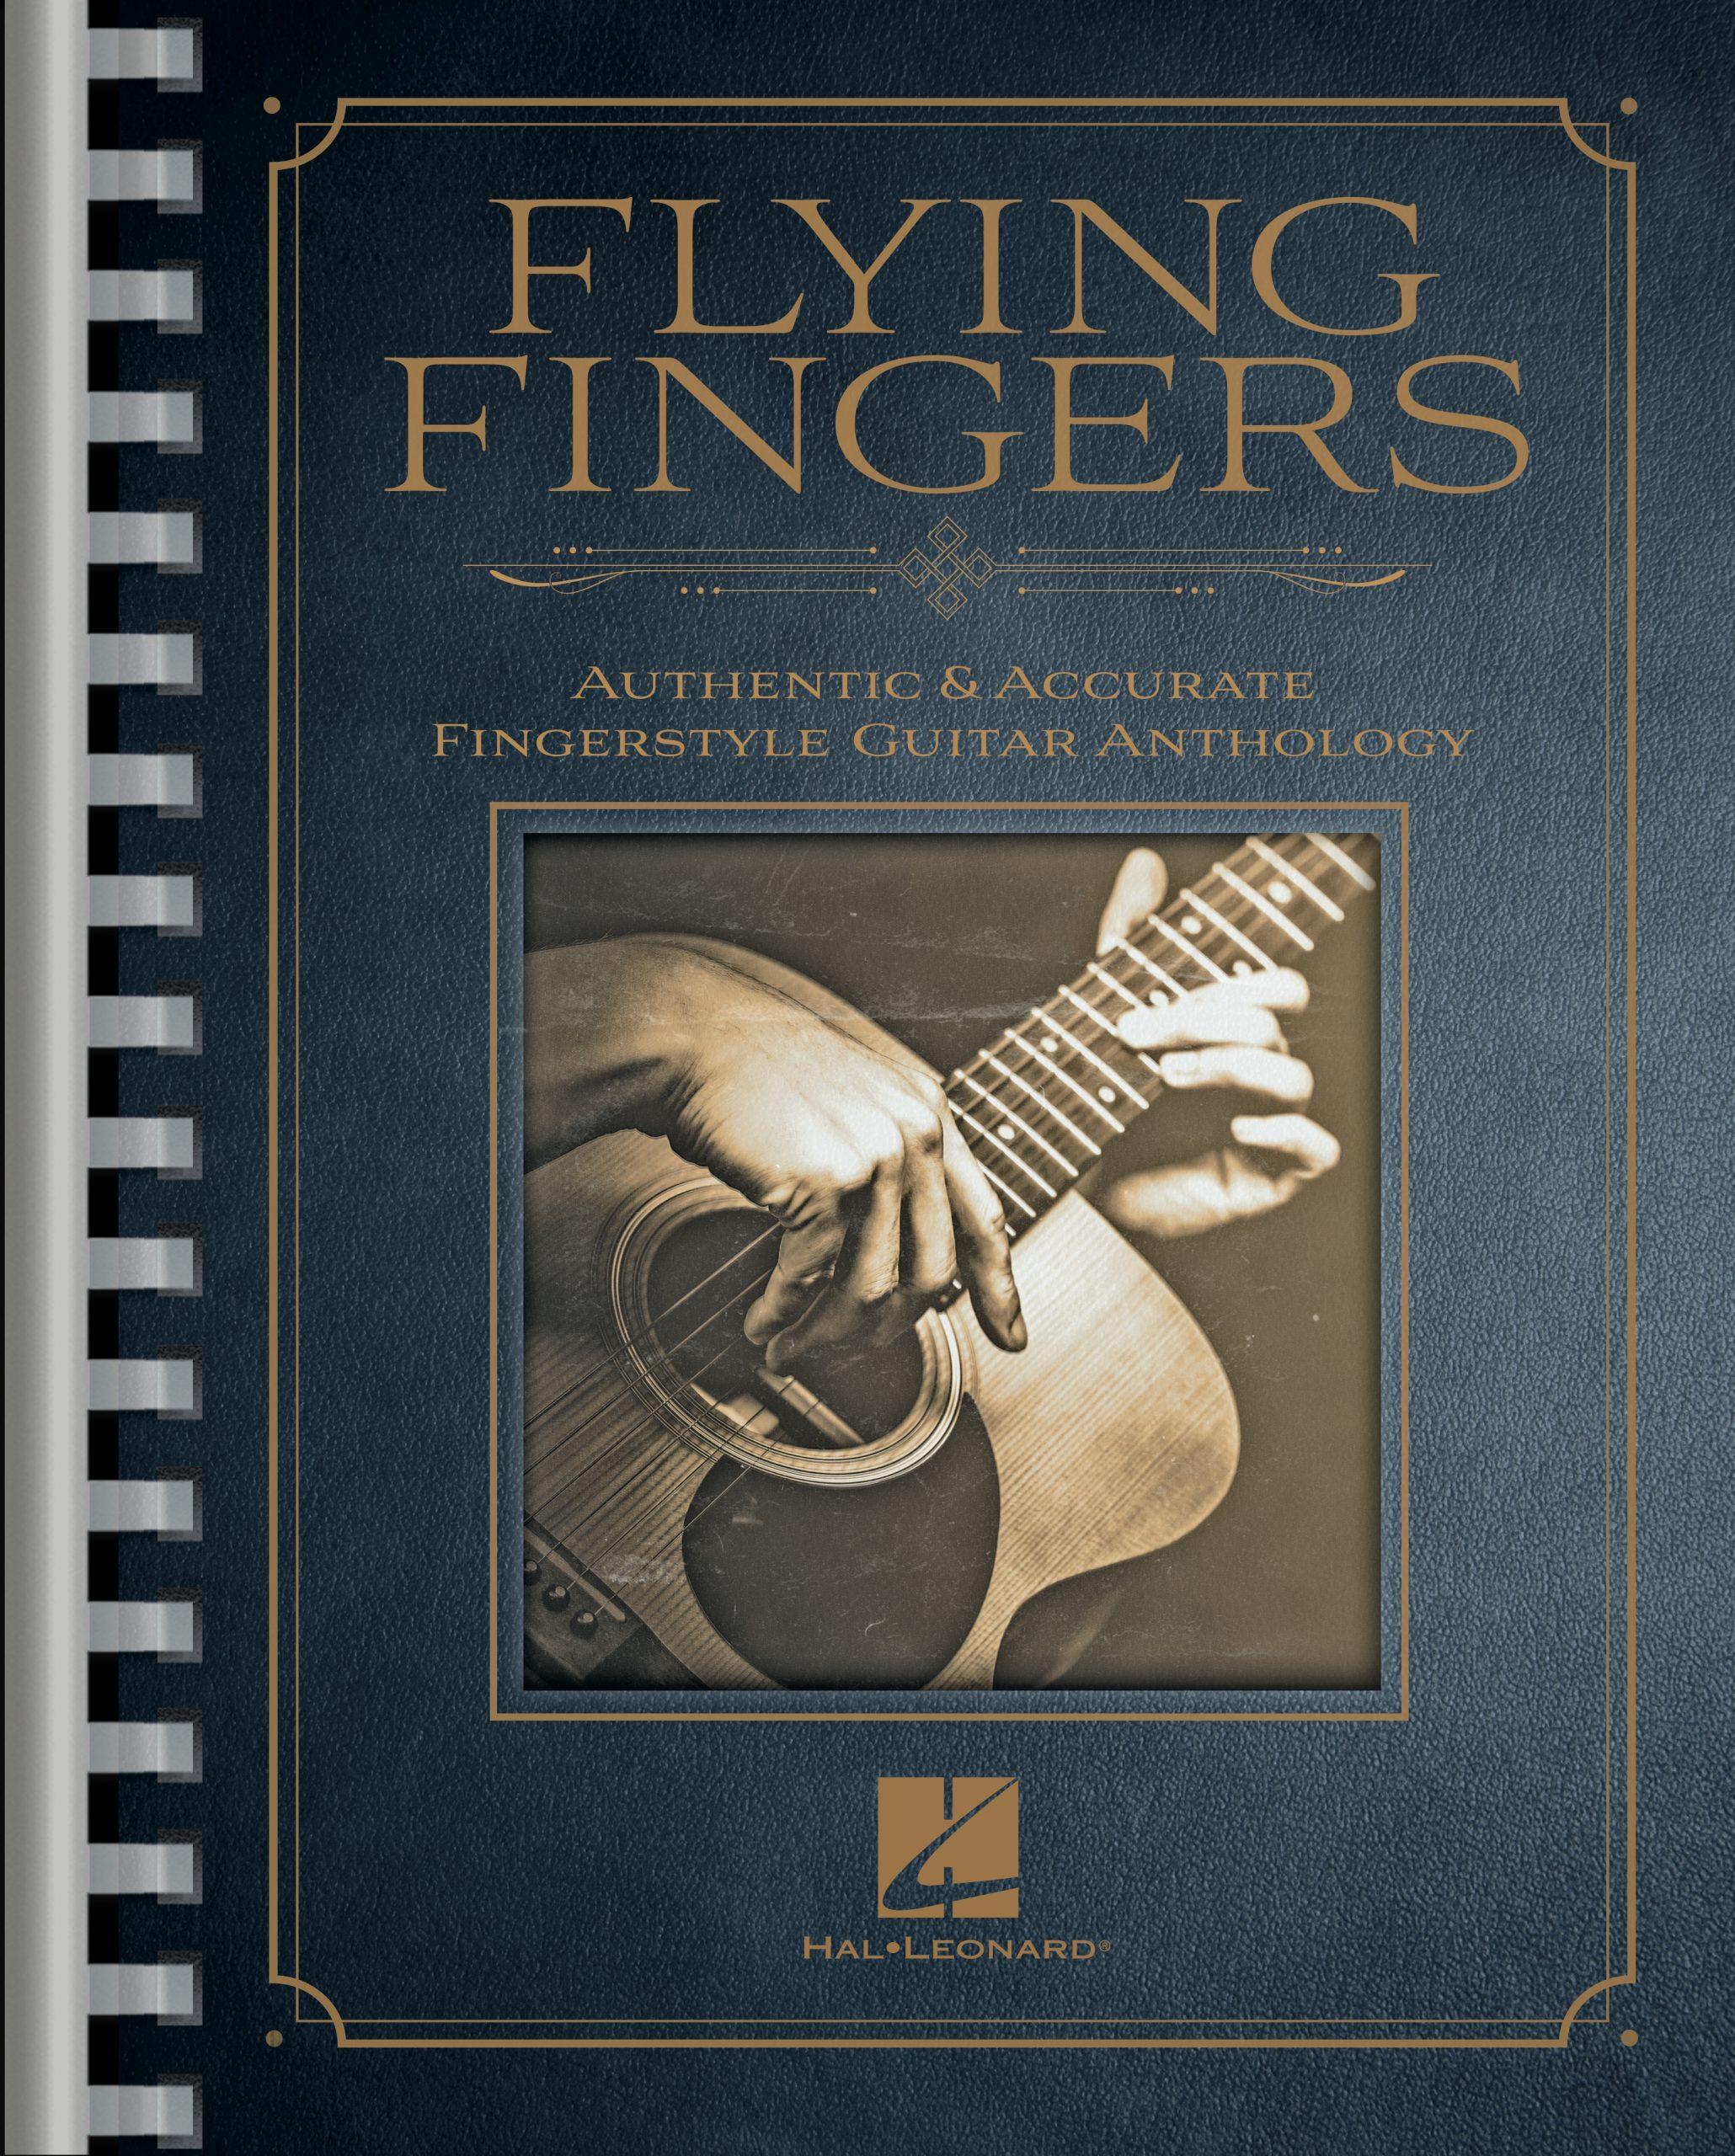 Hal Leonard, Product Showcase